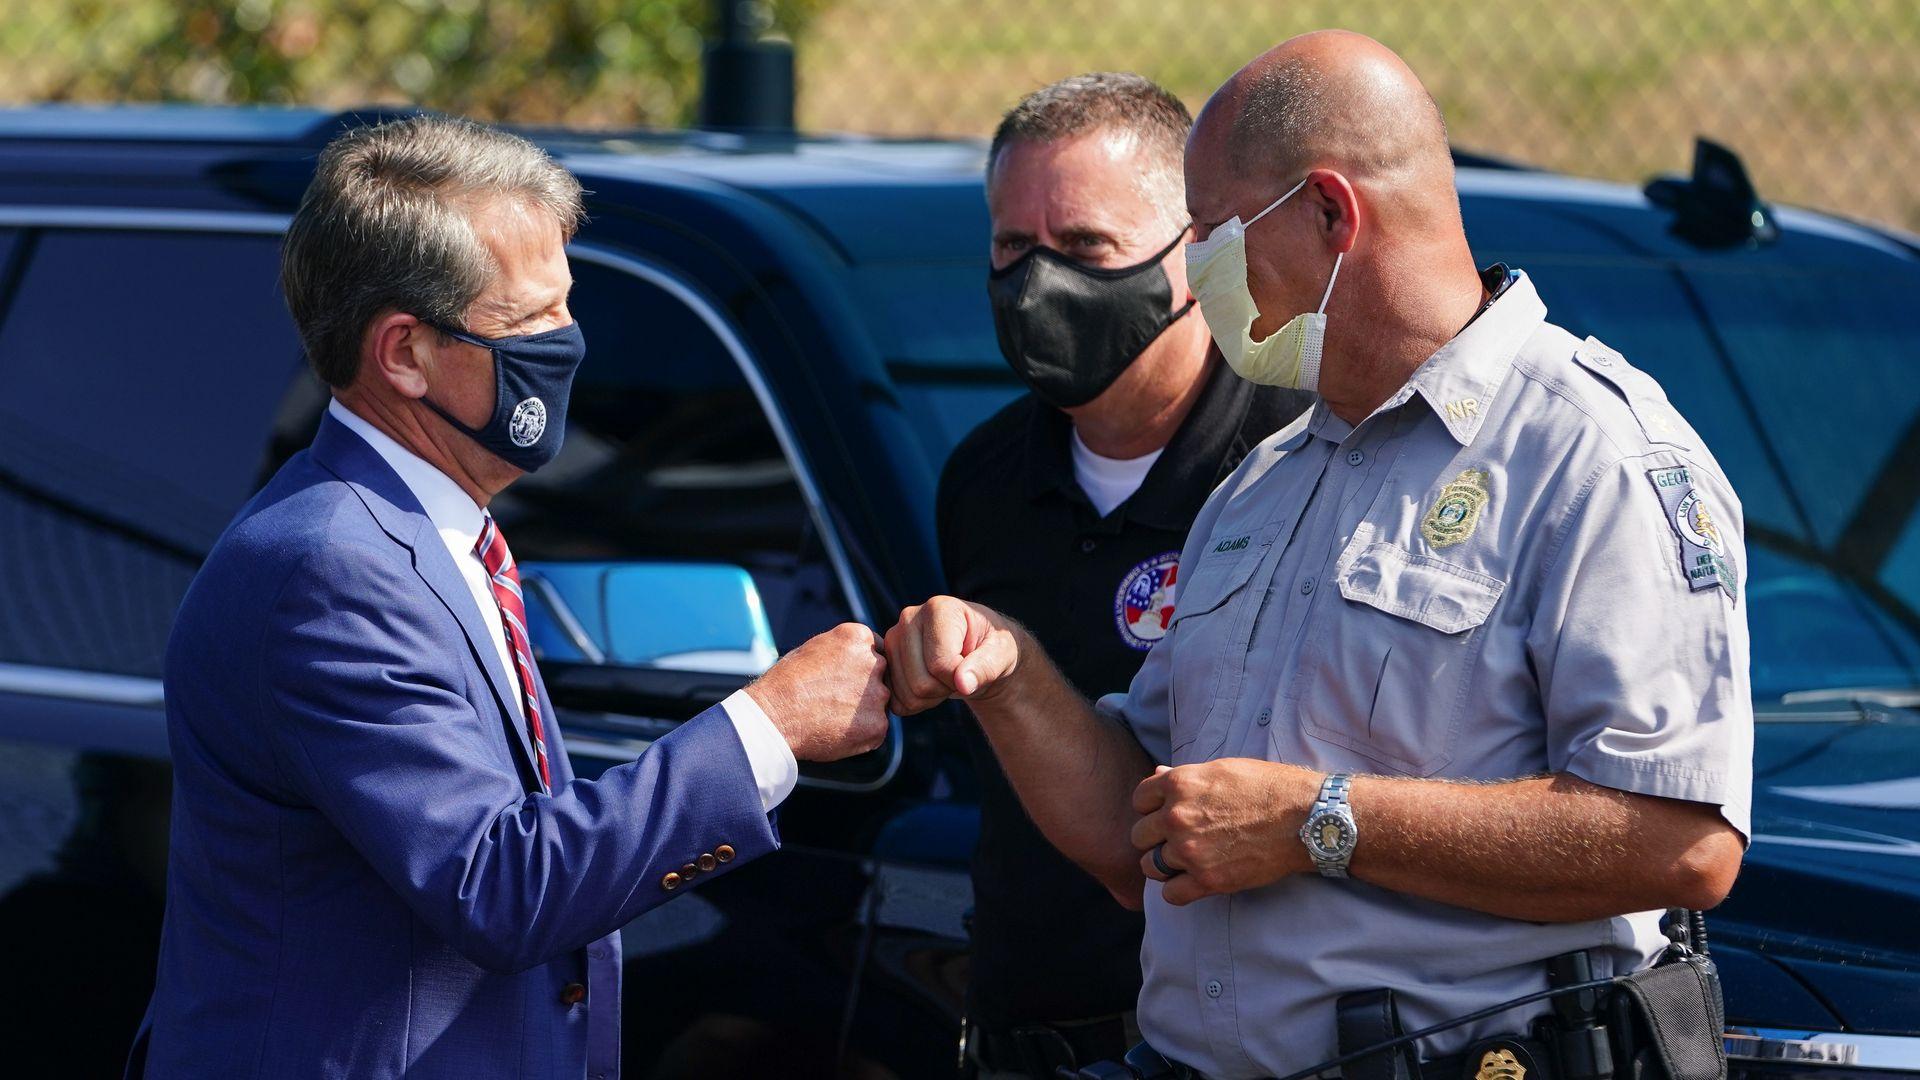 Gov. Brian Kemp of Georgia fist bumps a police officer.